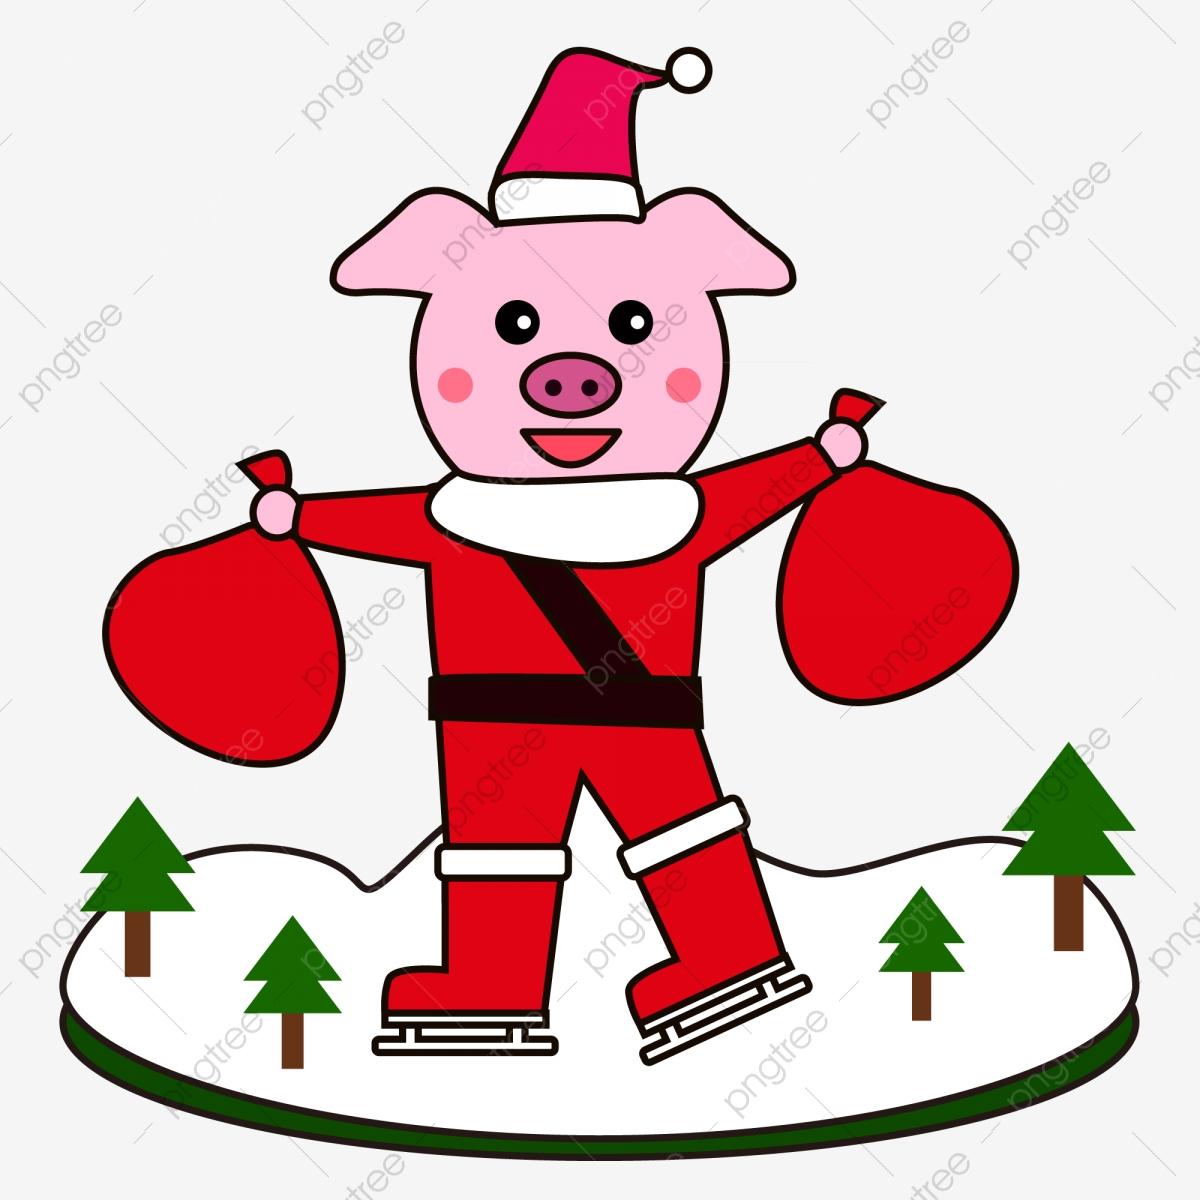 Christmas Pig Material Free To Pull, Pig Clipart, Christmas, Piggy.